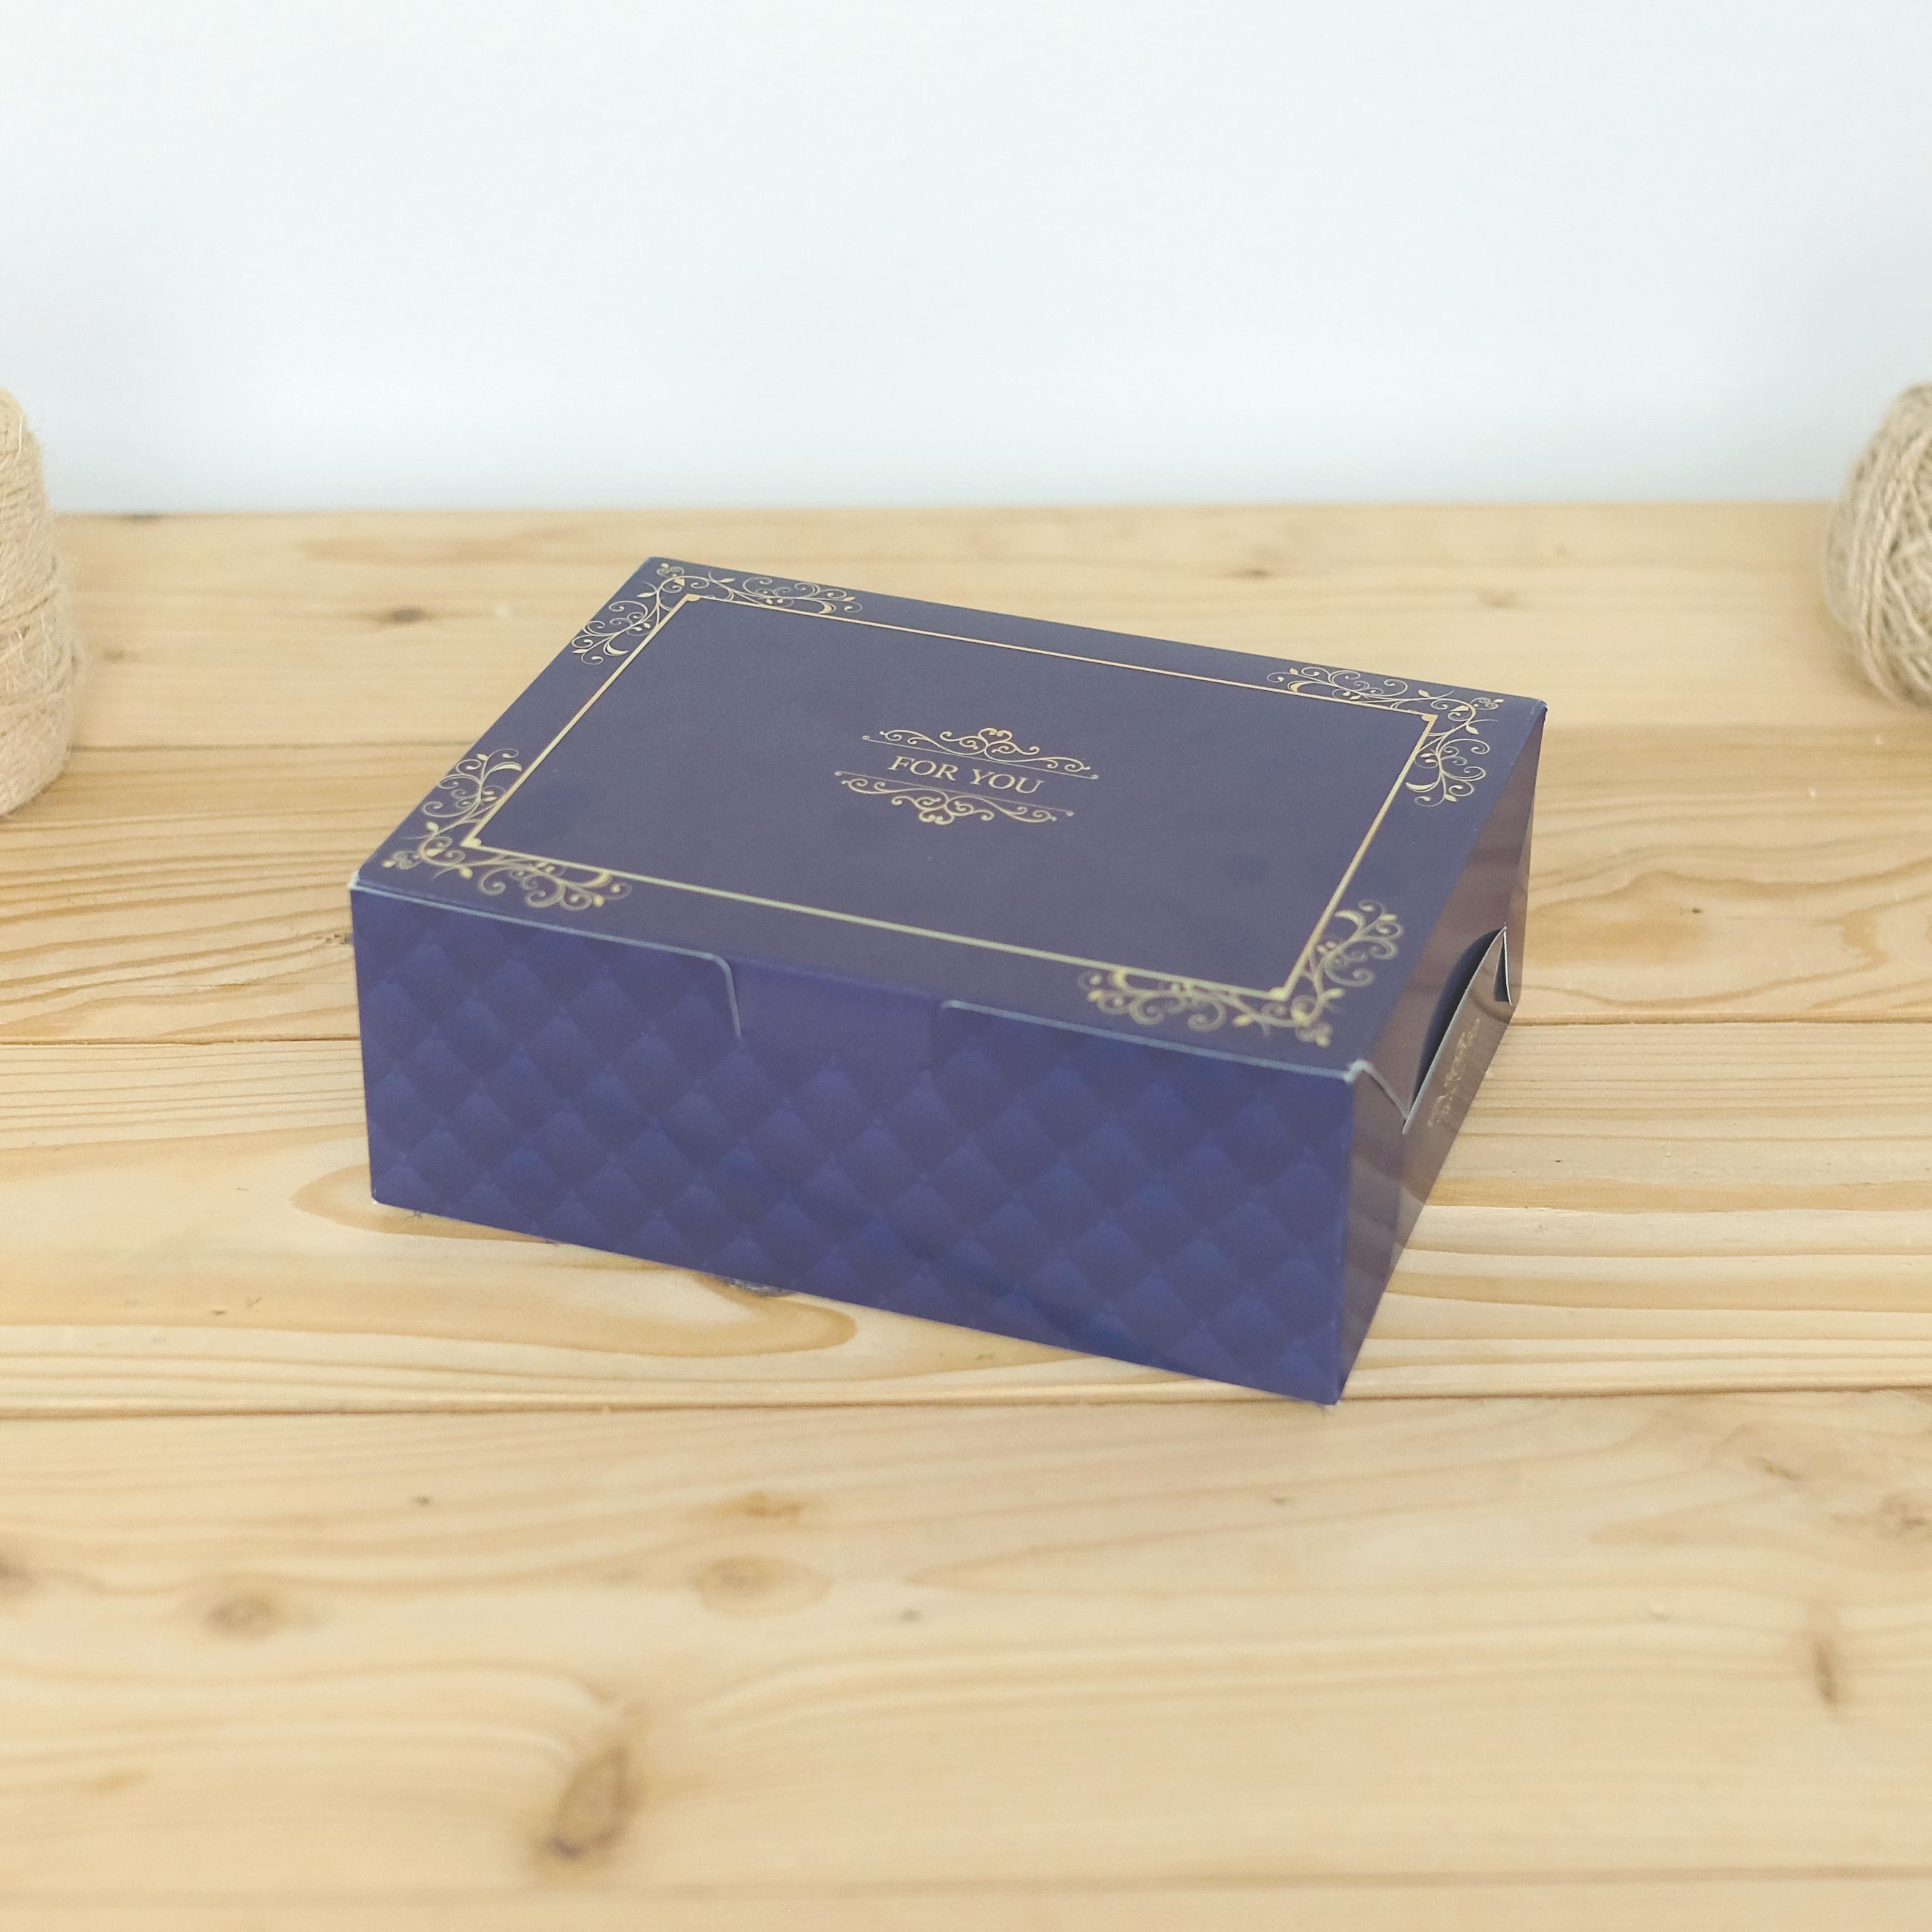 ECO Snack Box ทรงผืนผ้า สีน้ำเงินคลาสสิค